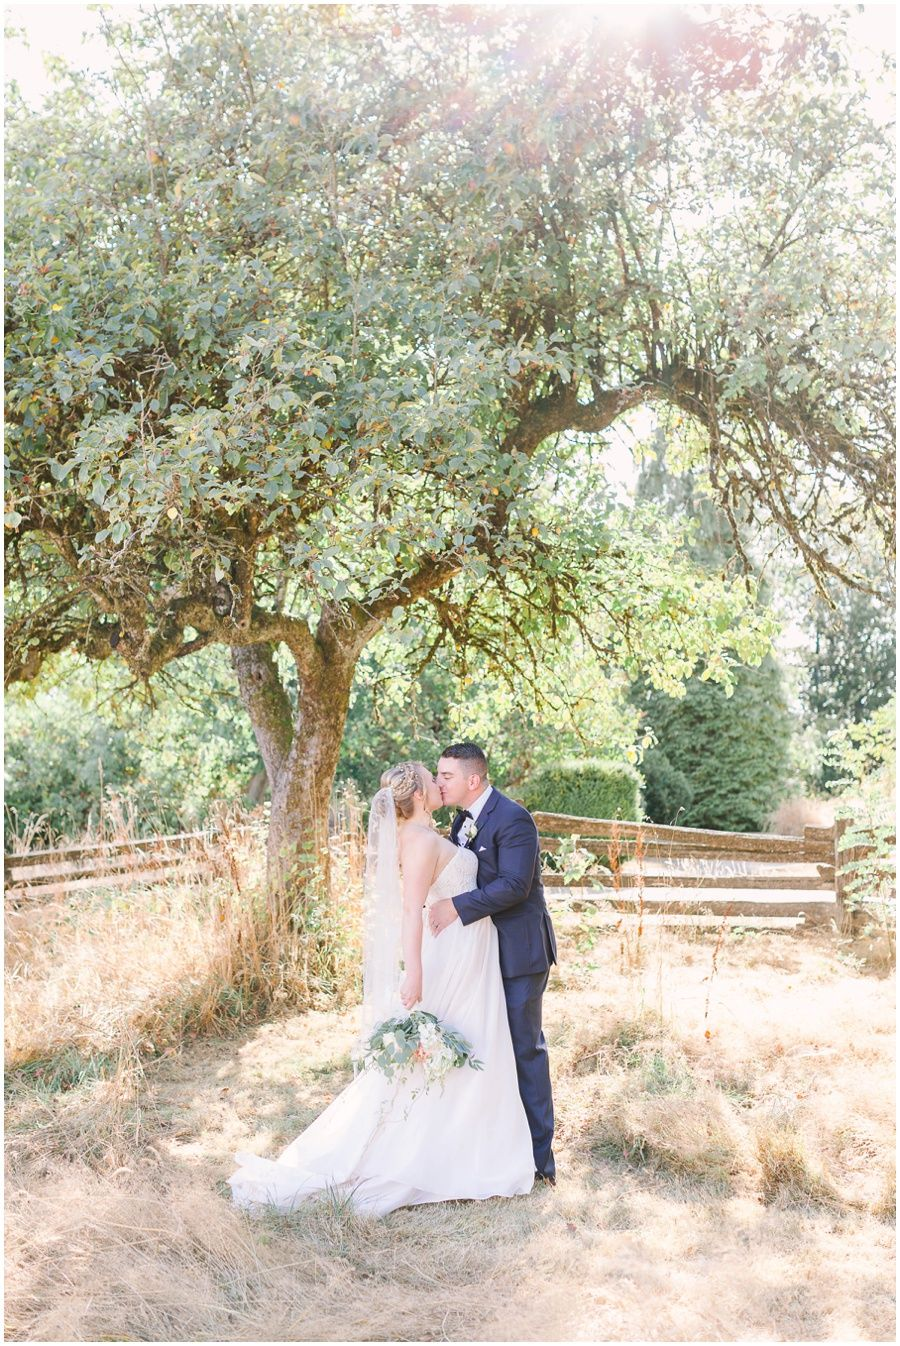 Estate 248 Wedding | Vancouver wedding photographer ...